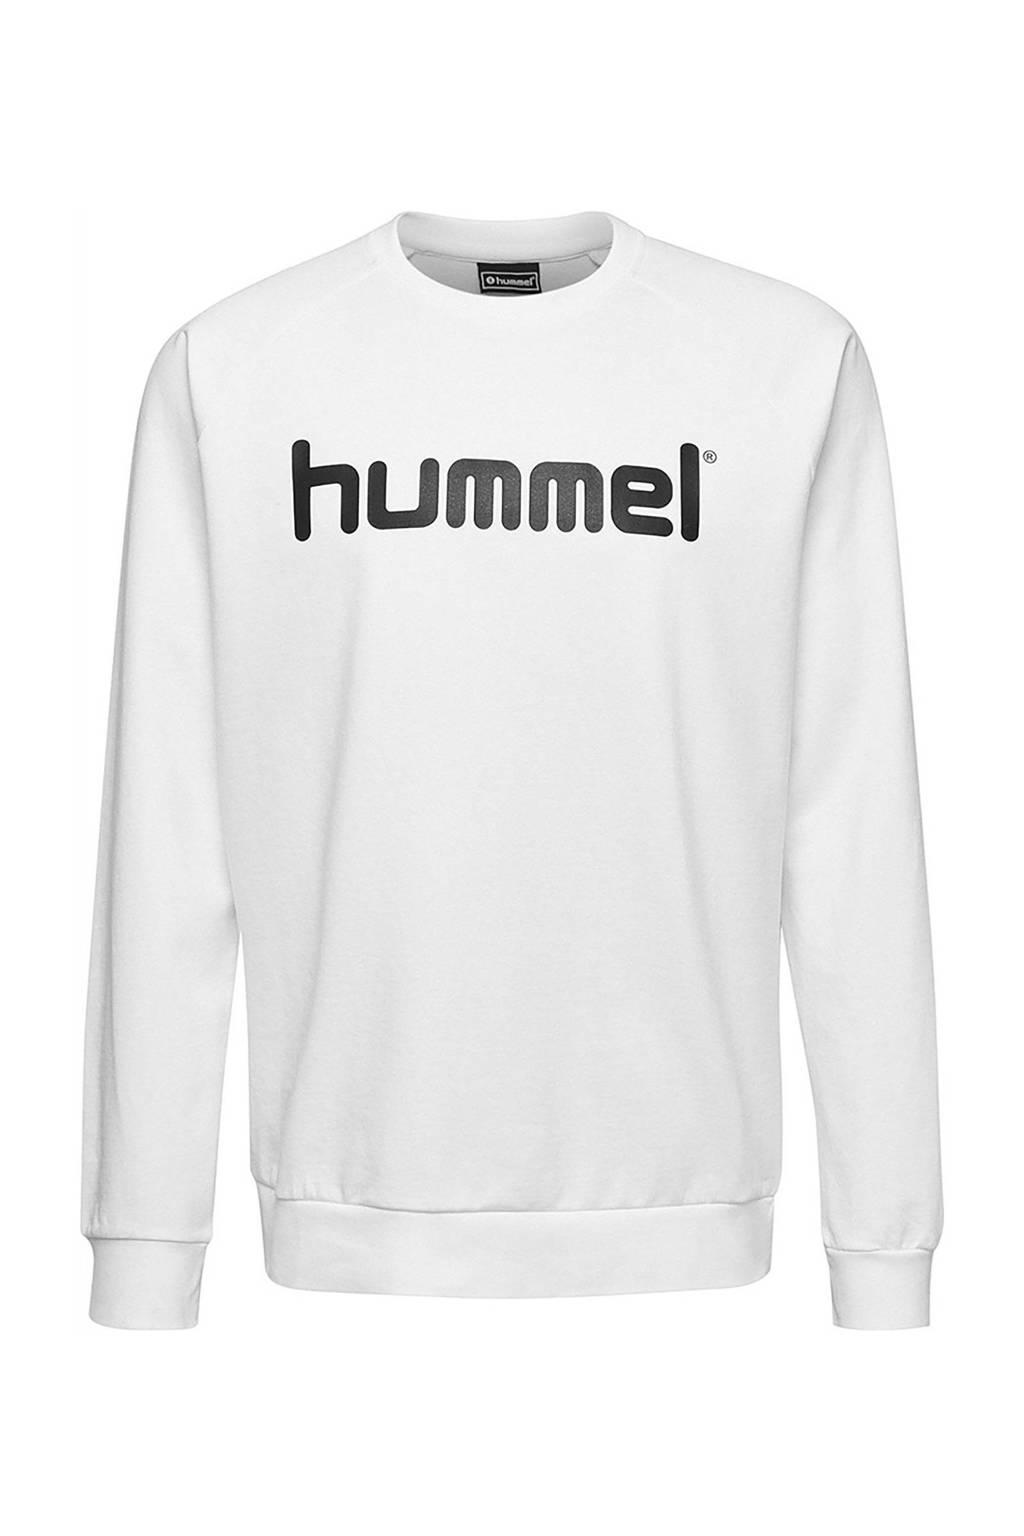 hummel sweater wit, Wit